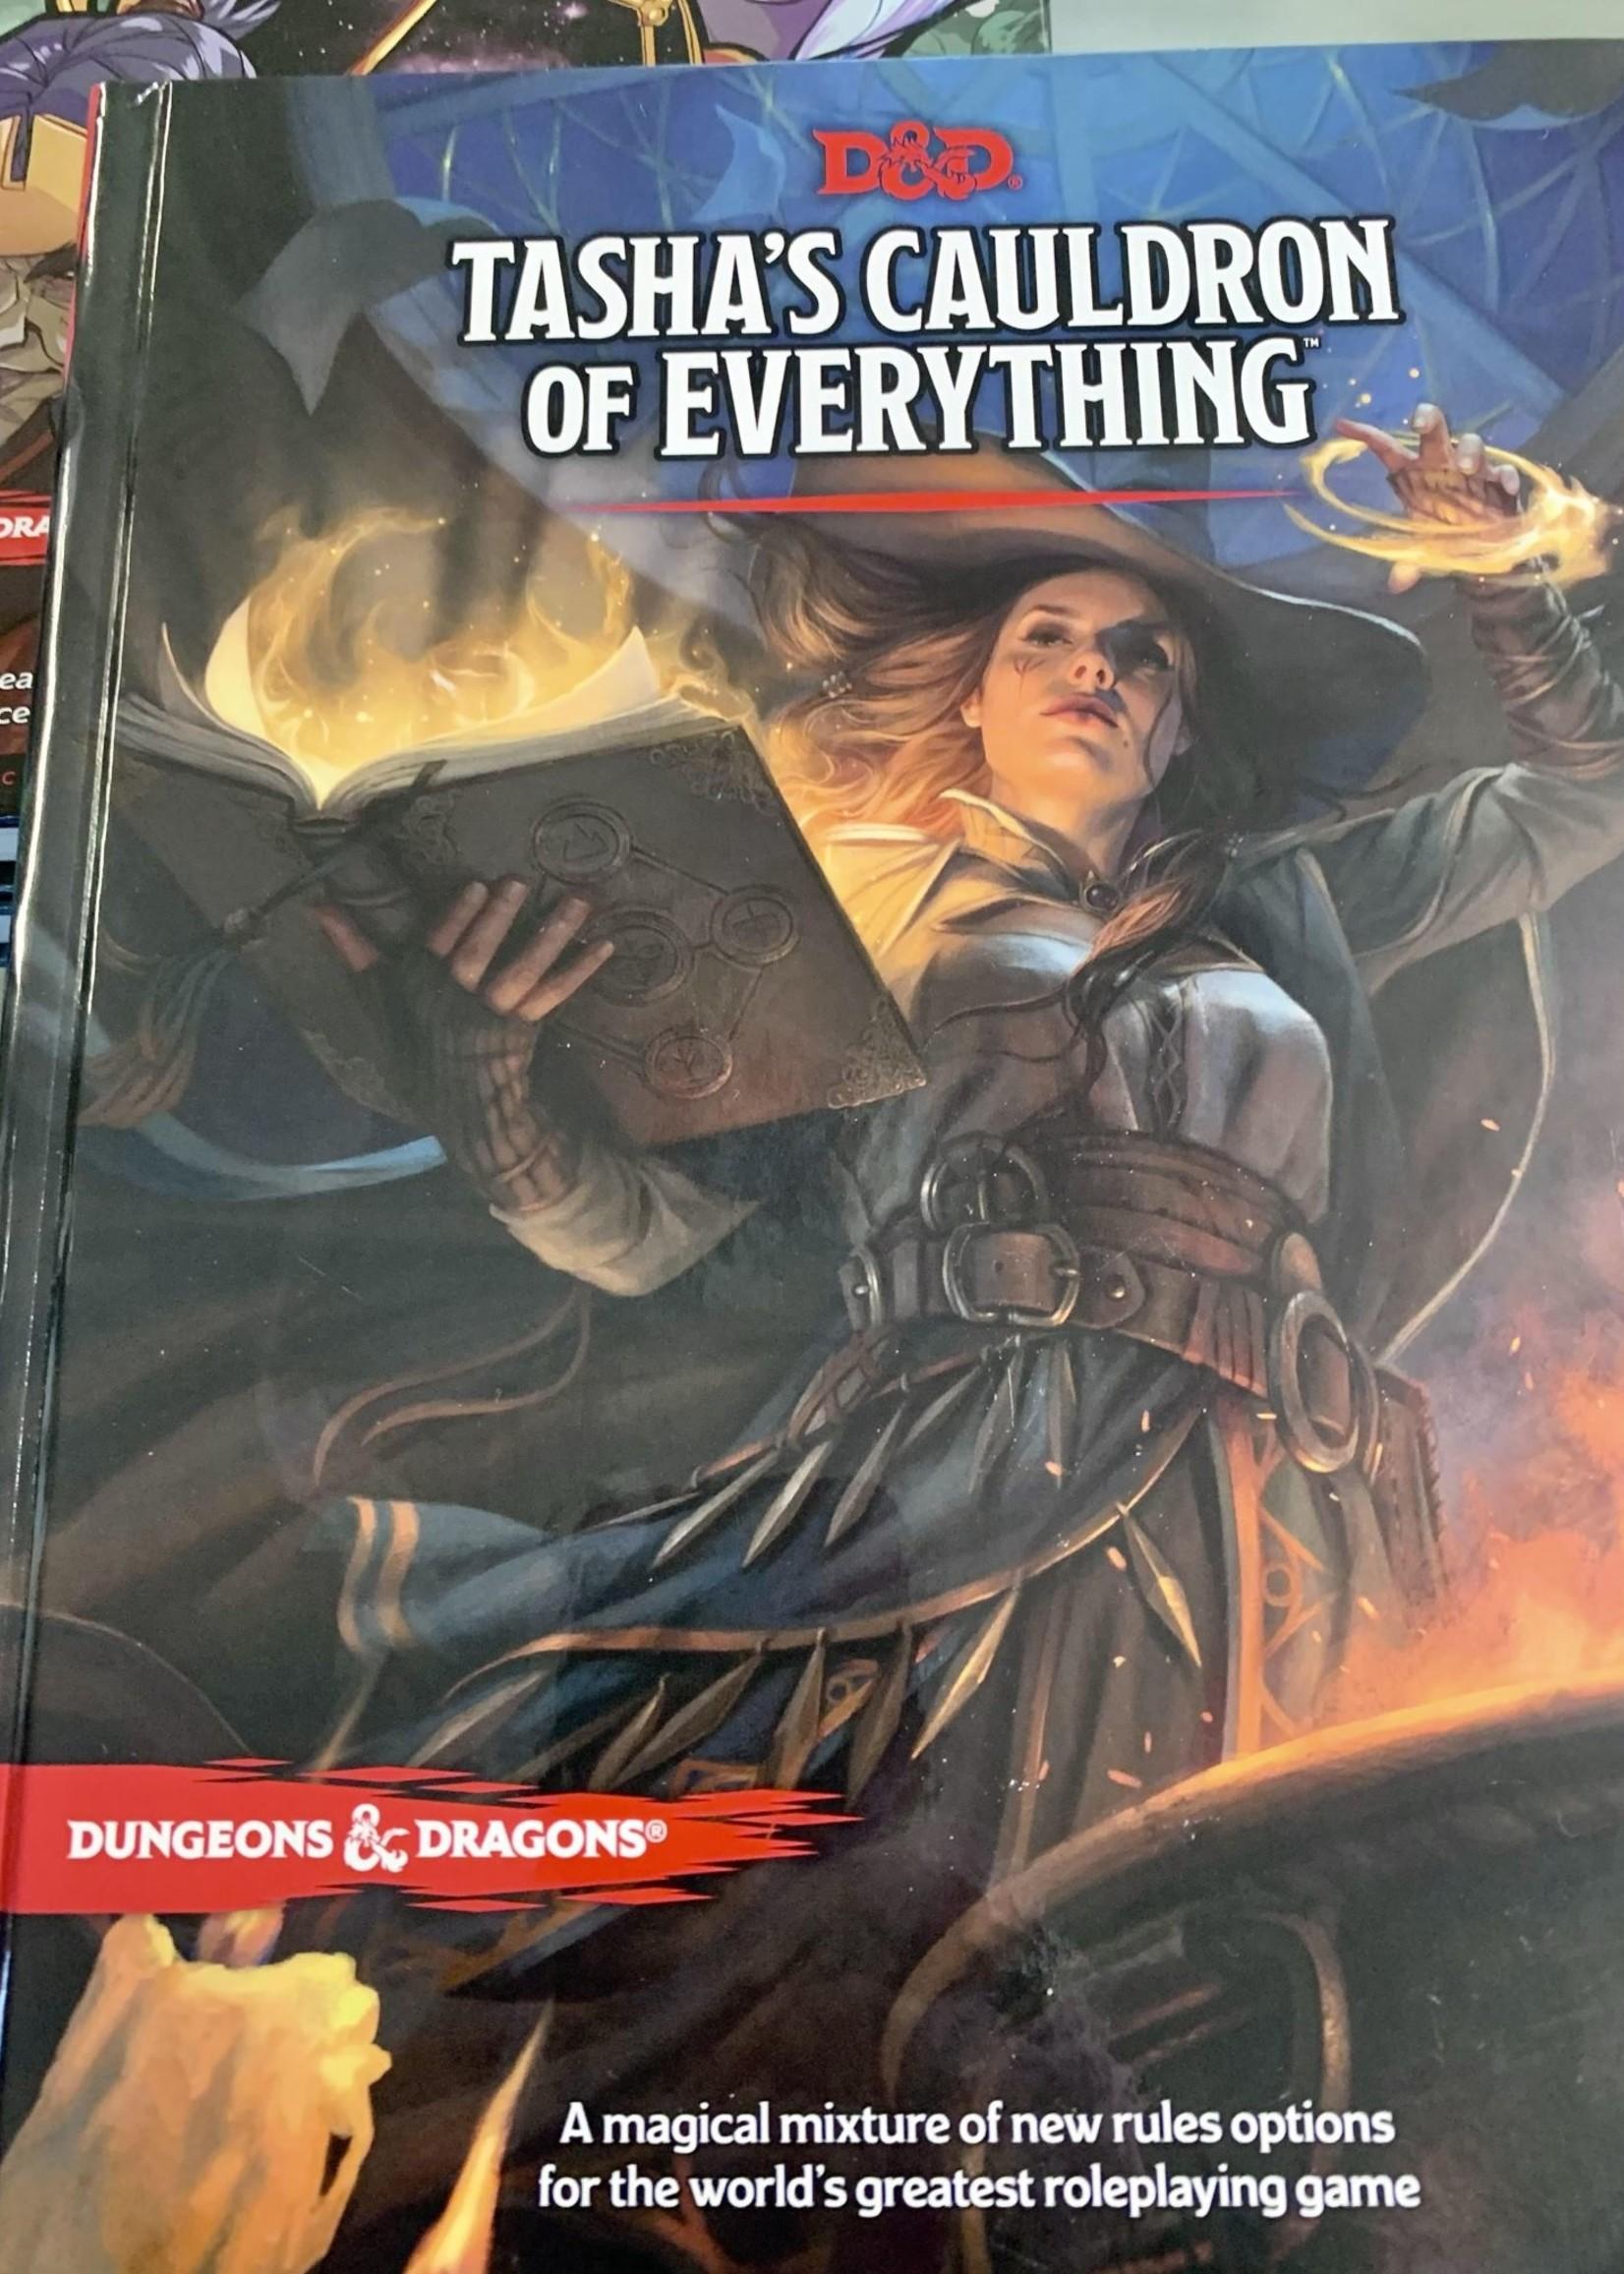 Dungeons & Dragons - Tasha's Cauldron of Everything